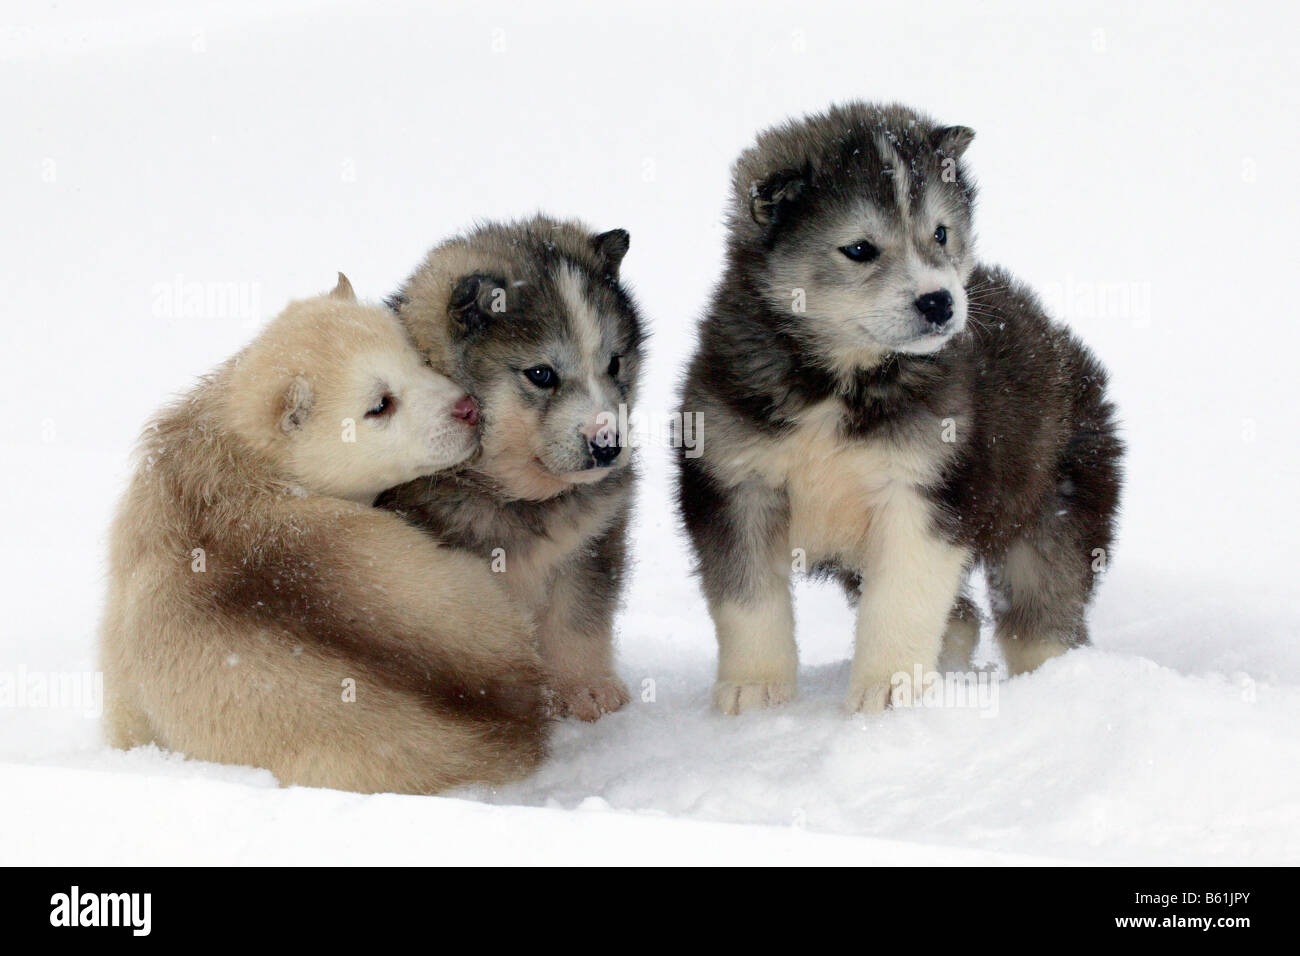 Husky (Canis lupus familiaris), puppies in snow - Stock Image